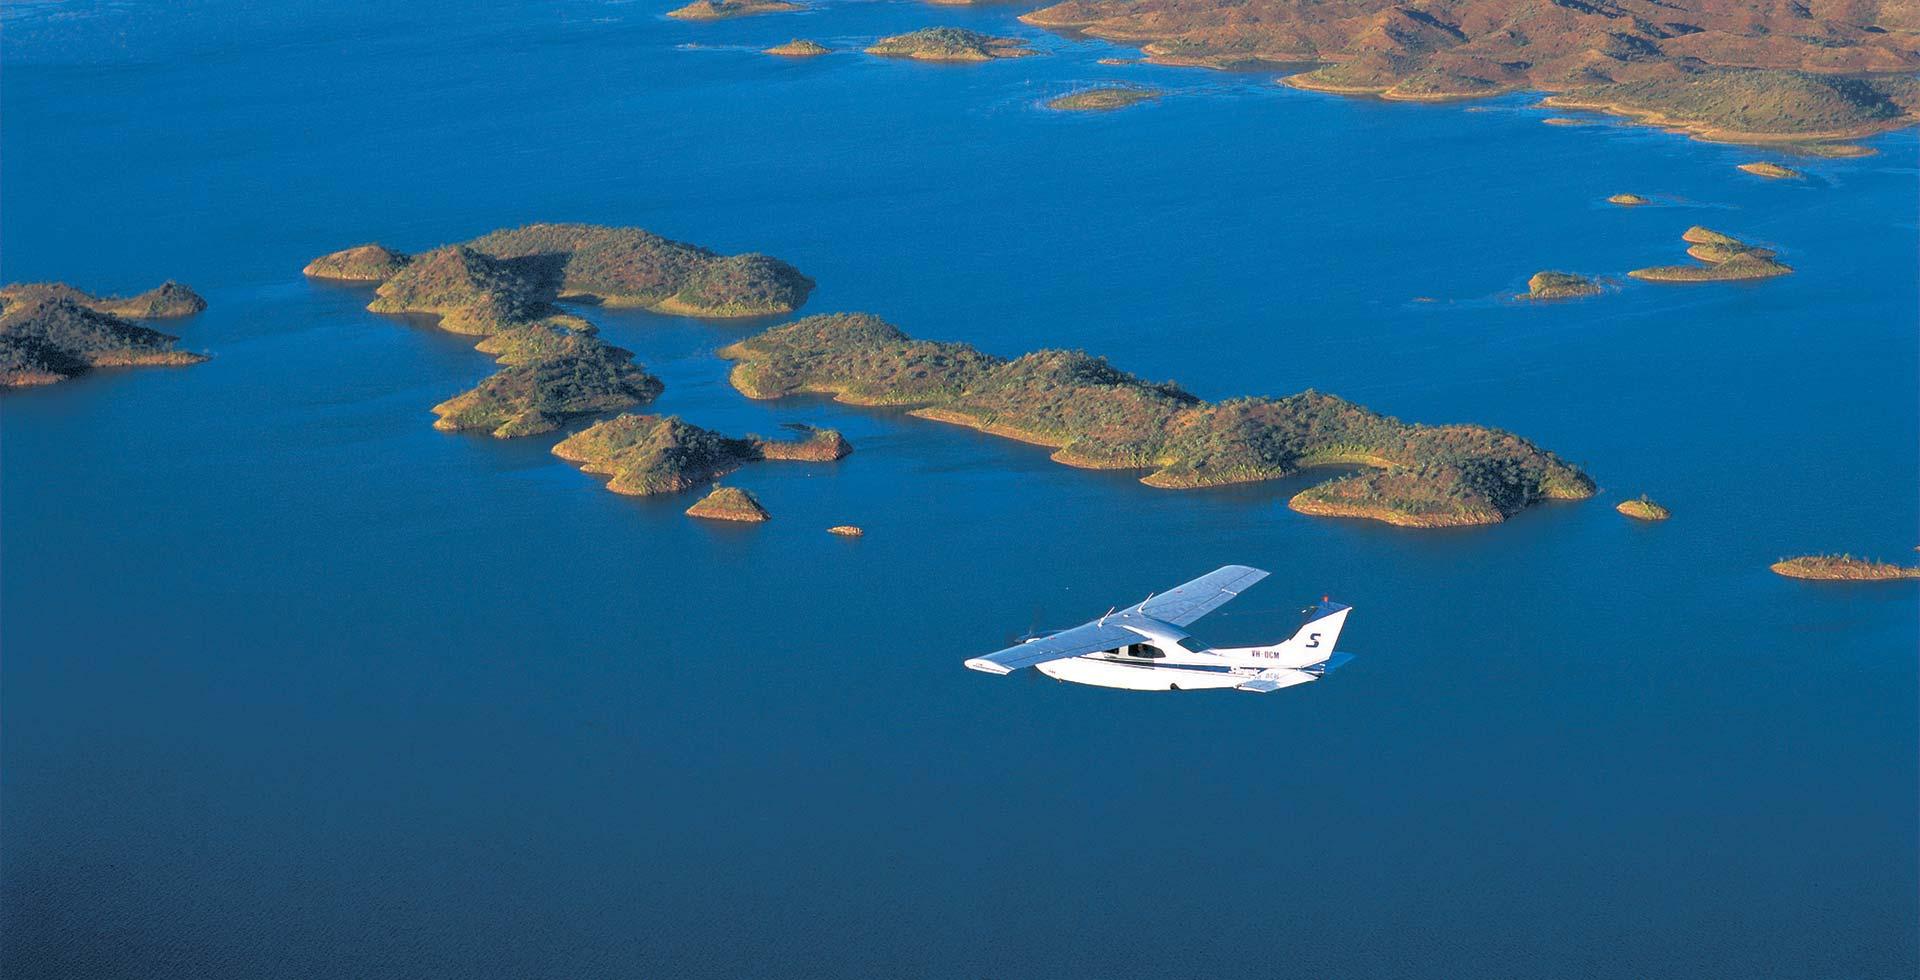 Fly across Lake Argyle near Kununurra and experience nature's beauty